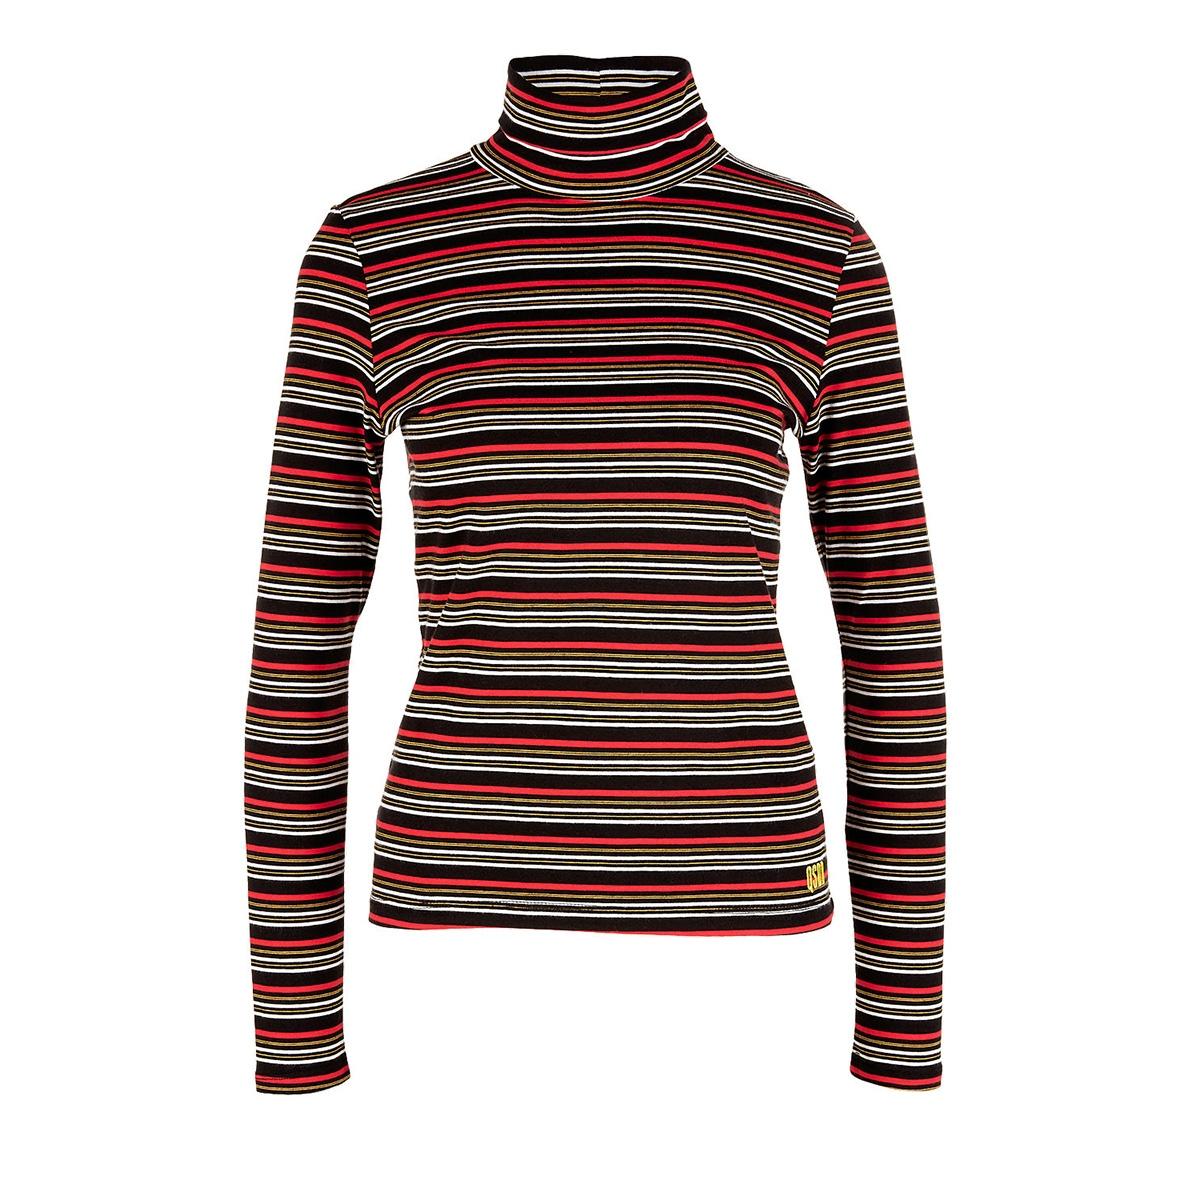 t shirt met col en lange mouwen 41910313145 q/s designed by t-shirt 99g0